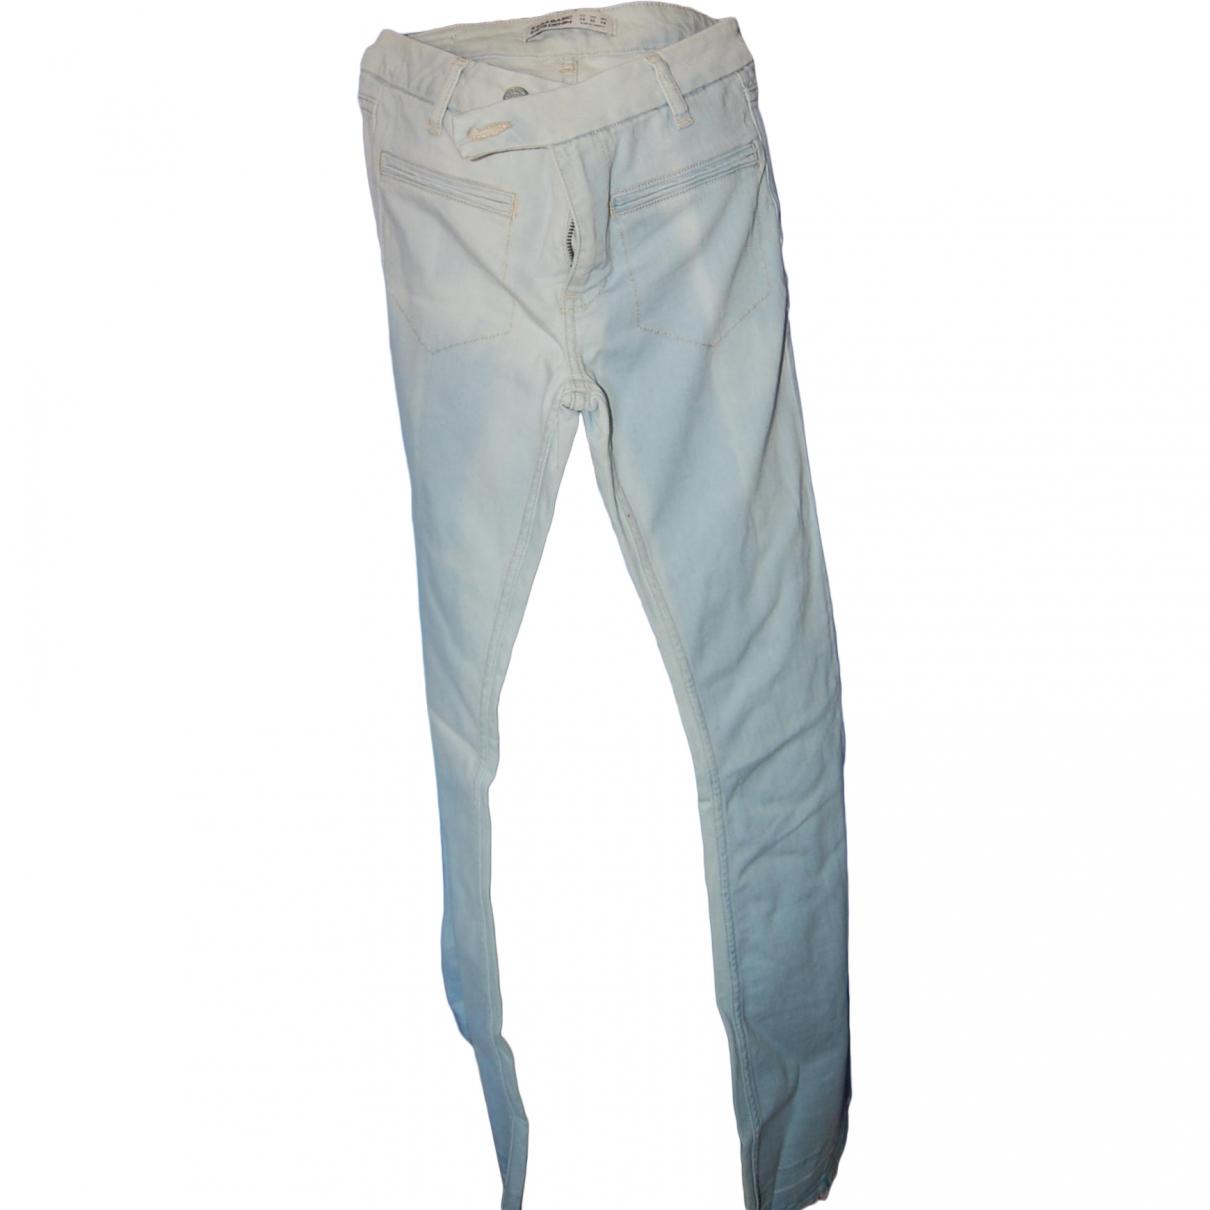 Zara \N Blue Denim - Jeans Jeans for Women 34 FR